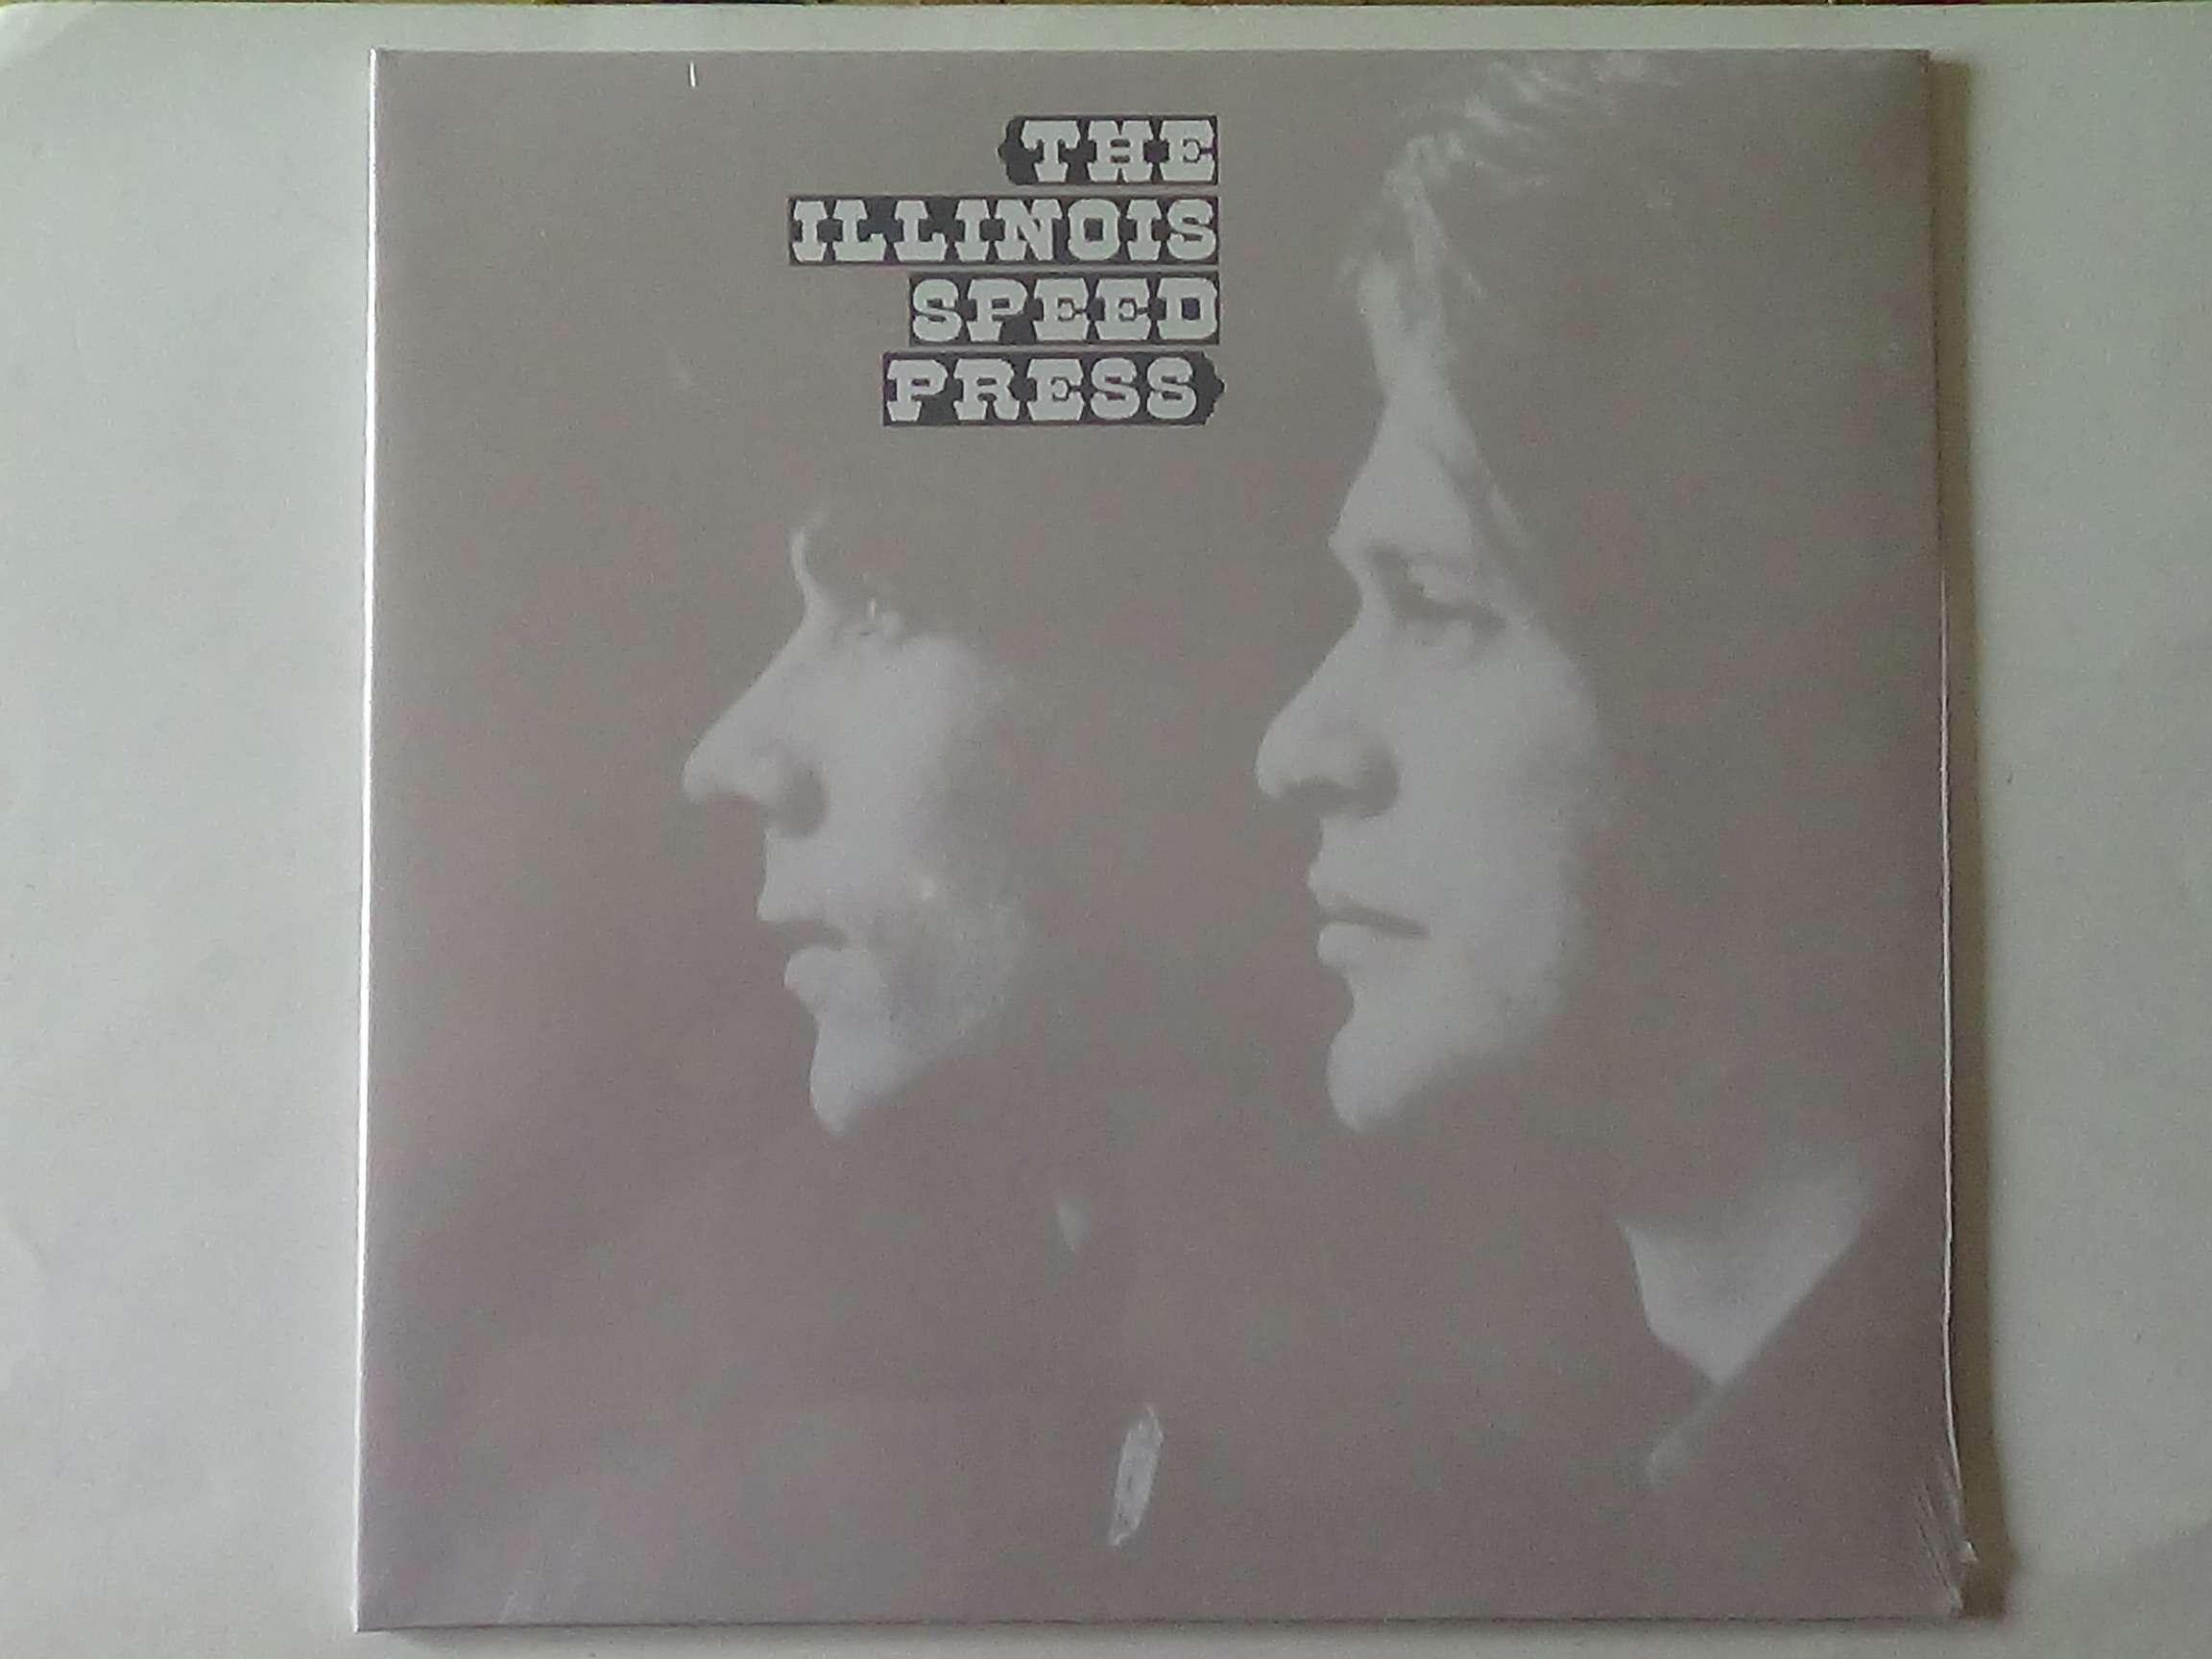 ILLINOIS SPEED PRESS - The Illinois Speed Press - LP